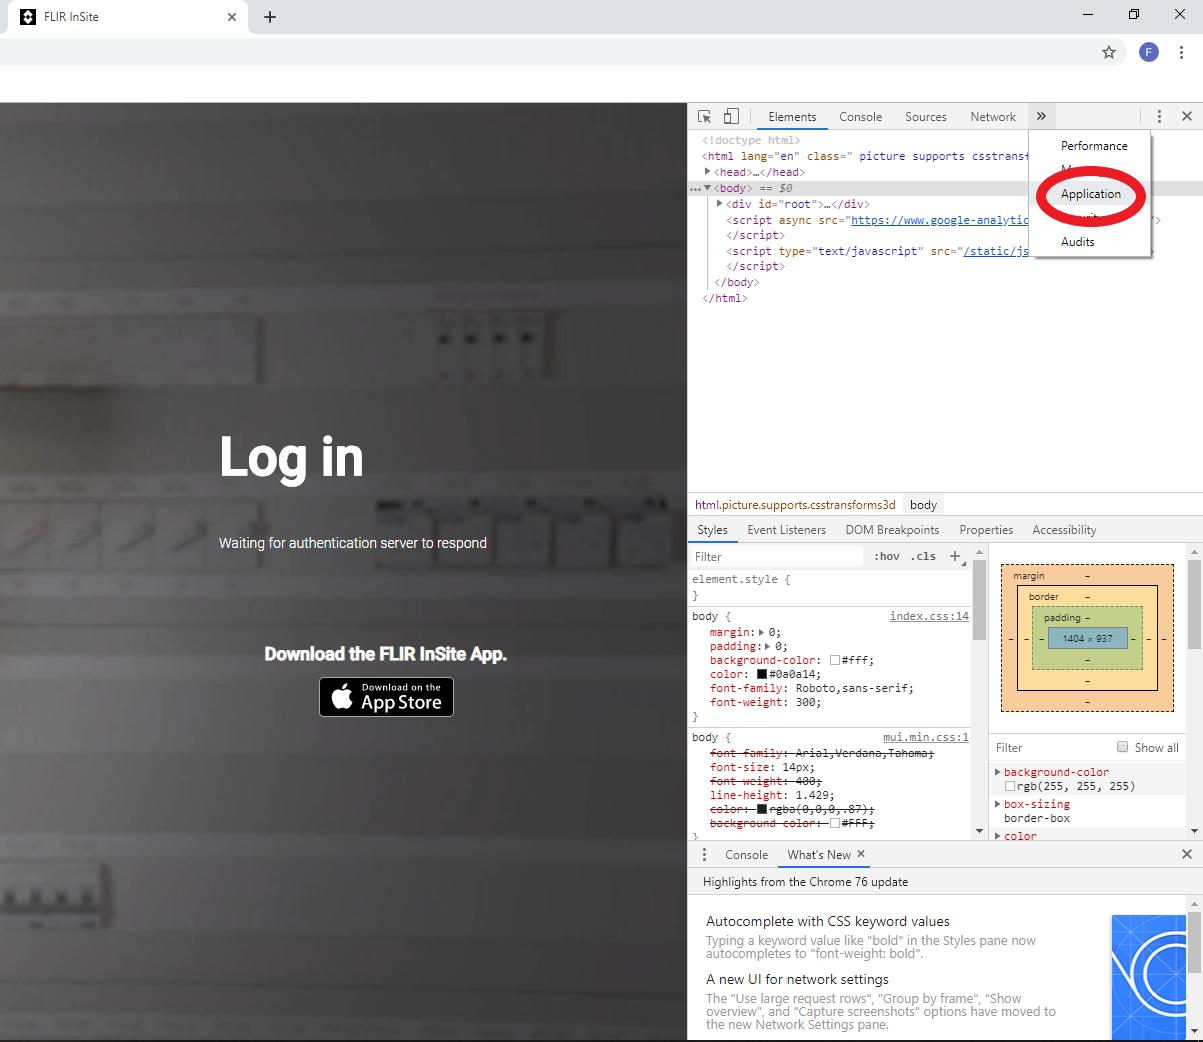 Cannot register/login to FLIR InSite?